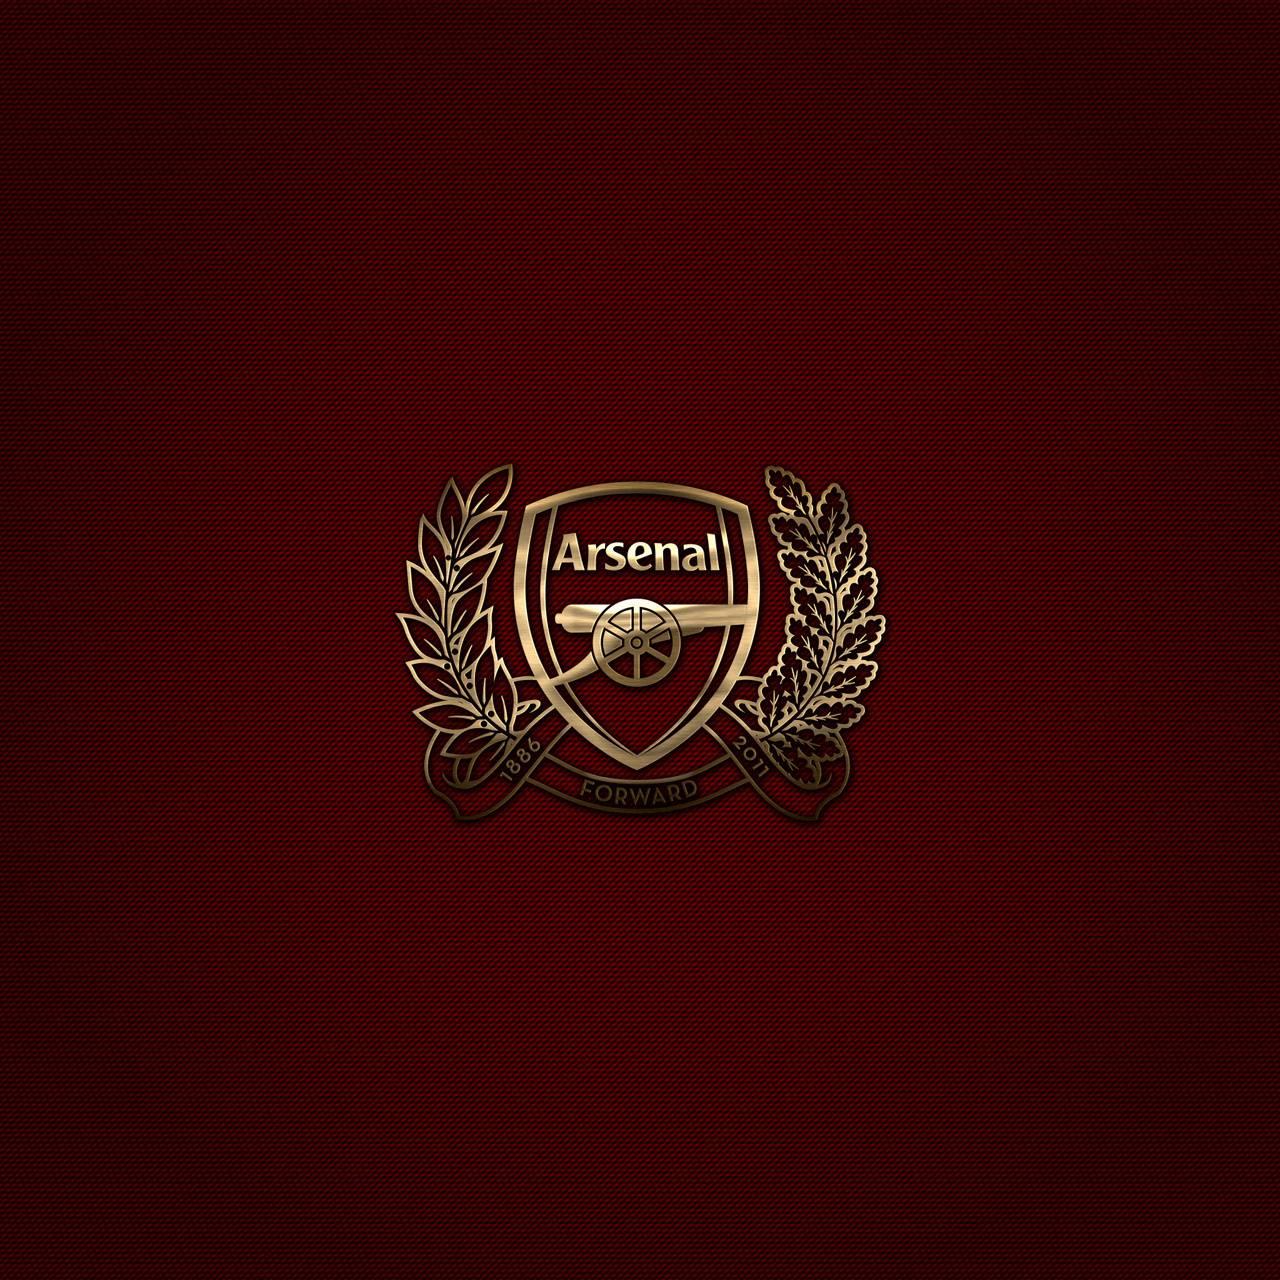 Arsenal 125 Years